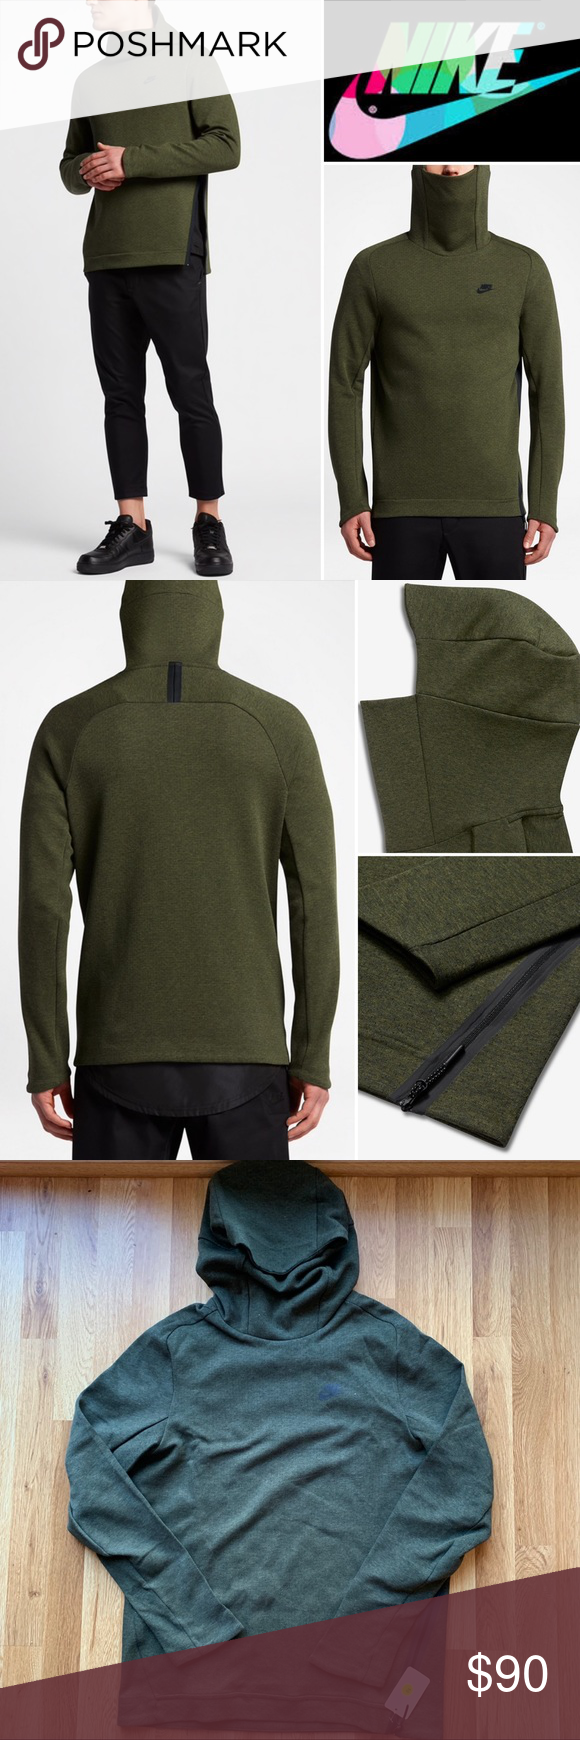 497204f27a6a Nike Sportswear Tech Fleece Funnel Hoodie Medium Color  Legion Green Size   Medium Feel and